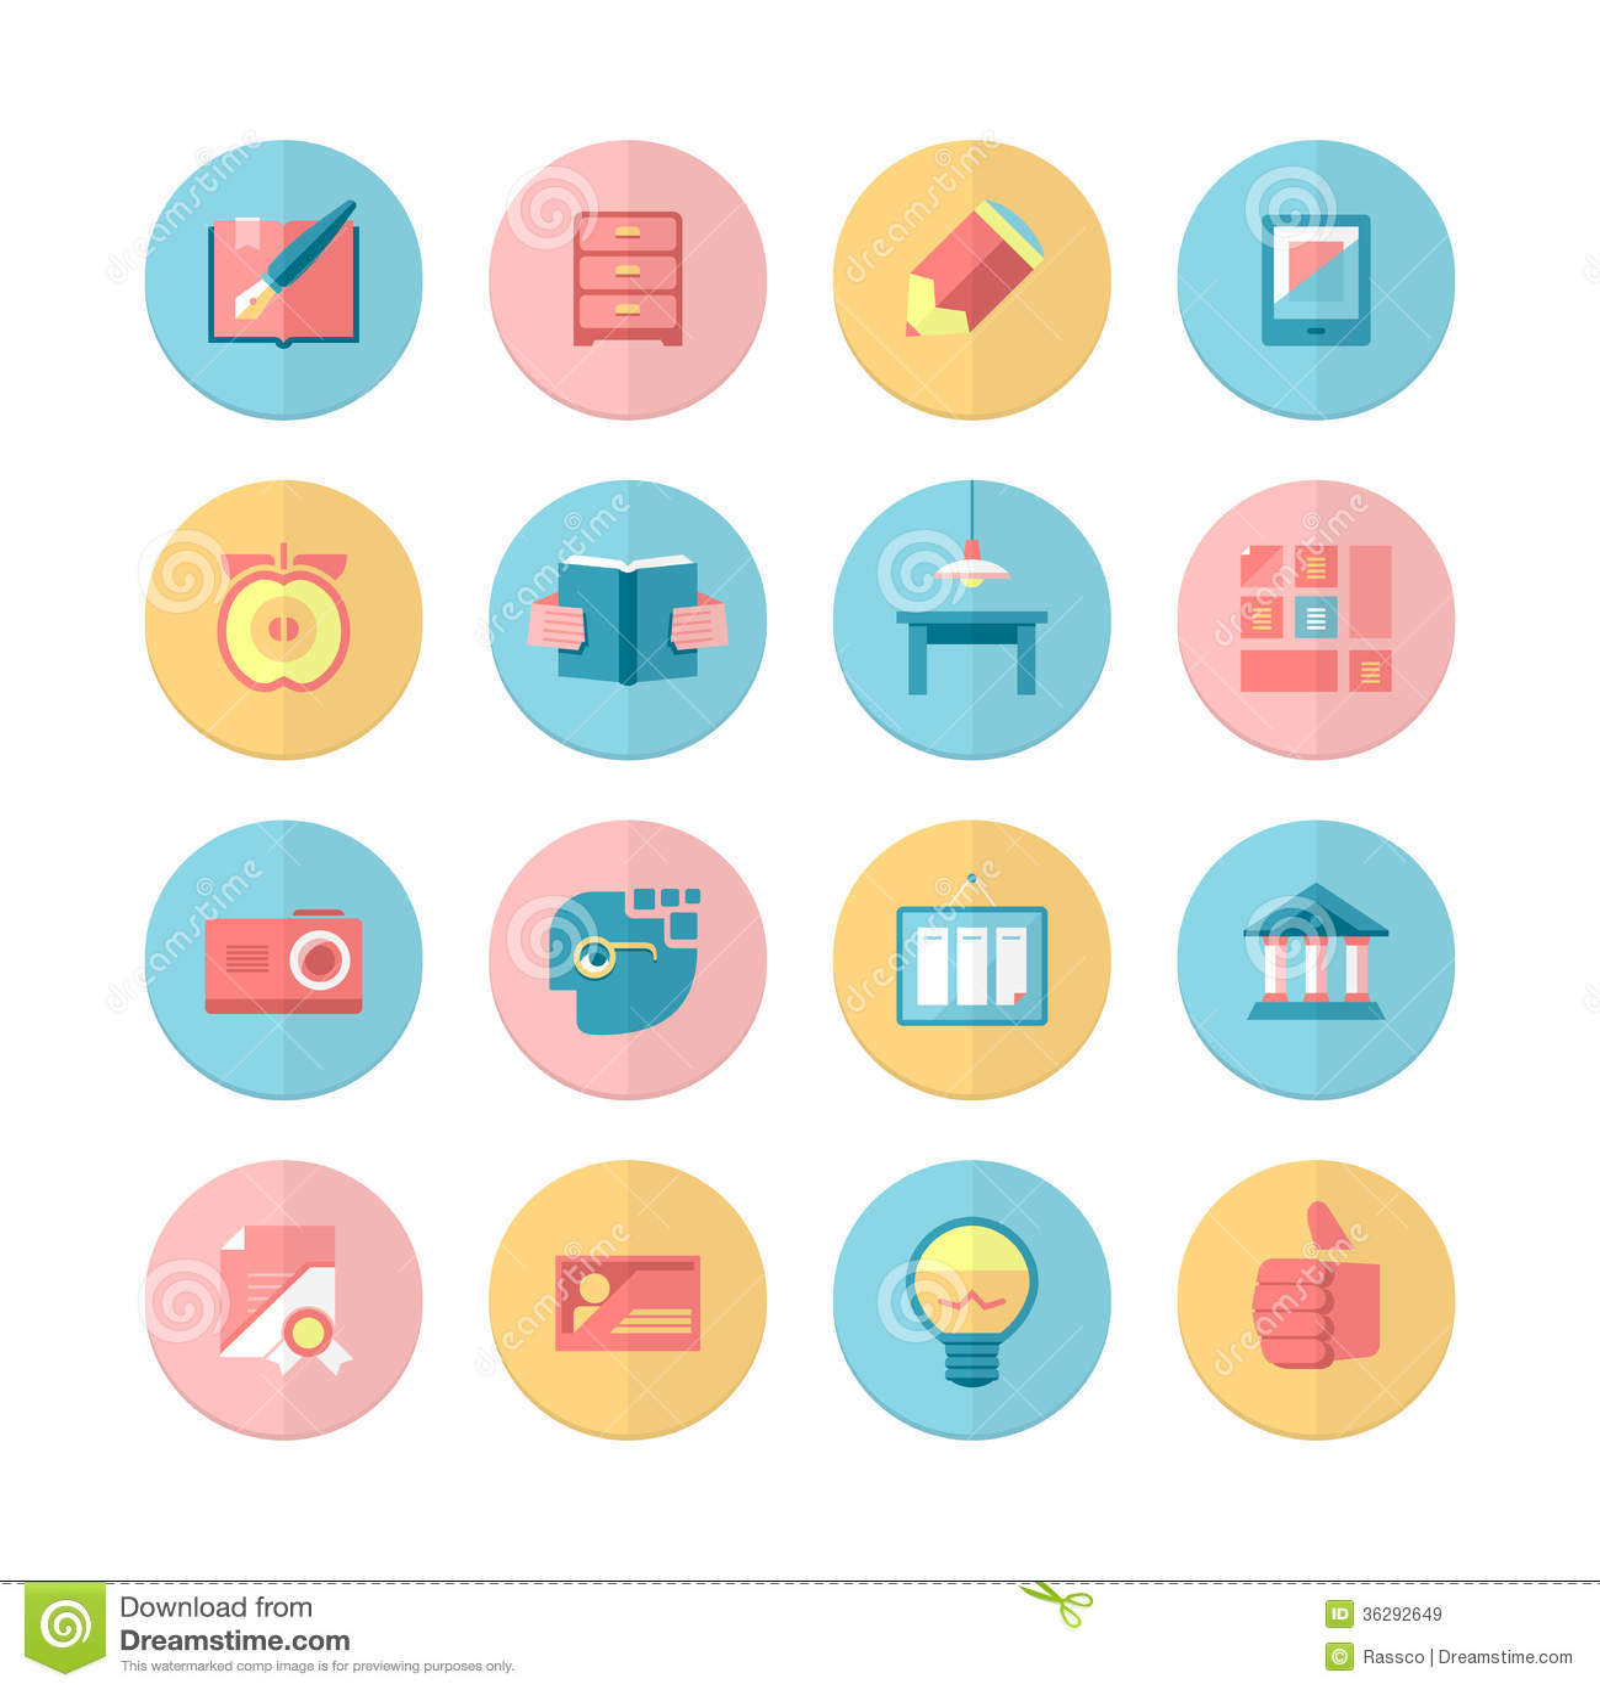 Education And Training 16 Flat Icons Set Royalty Free